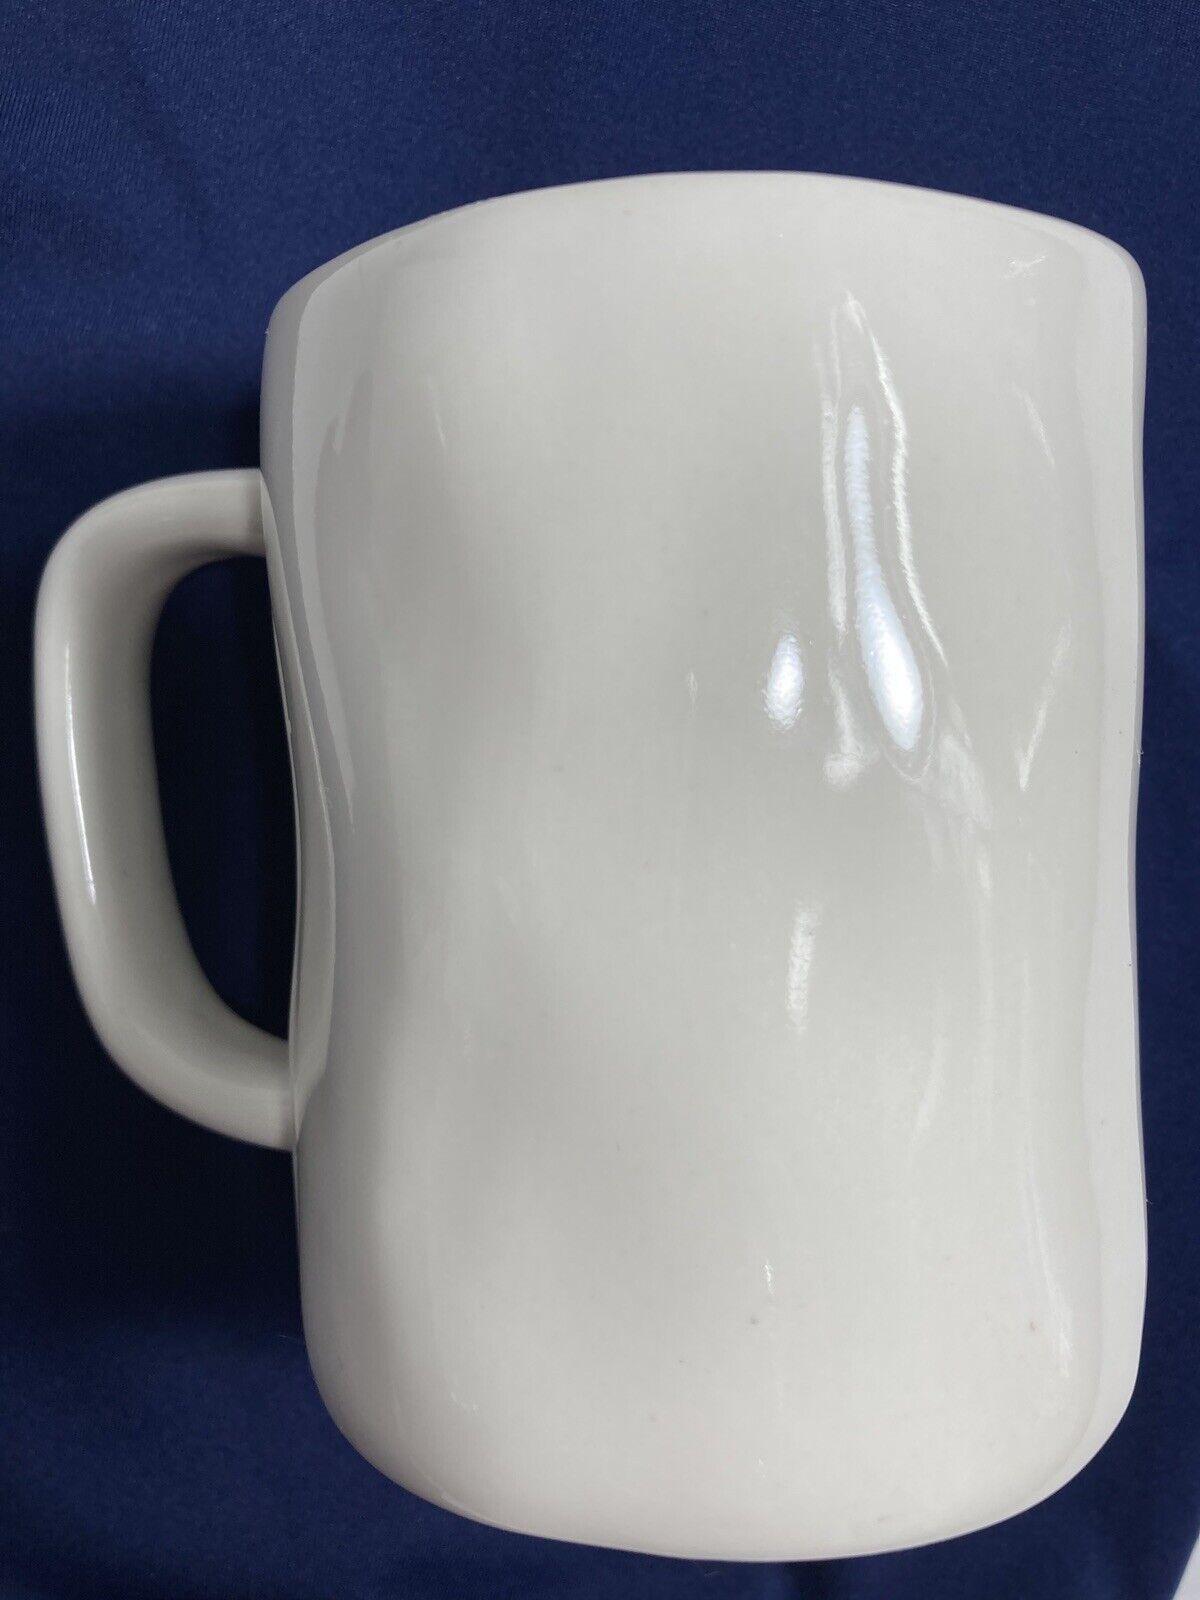 Rae Dunn HIS Artisan Collection Magenta White Coffee Mug Large Black Letters - $14.00